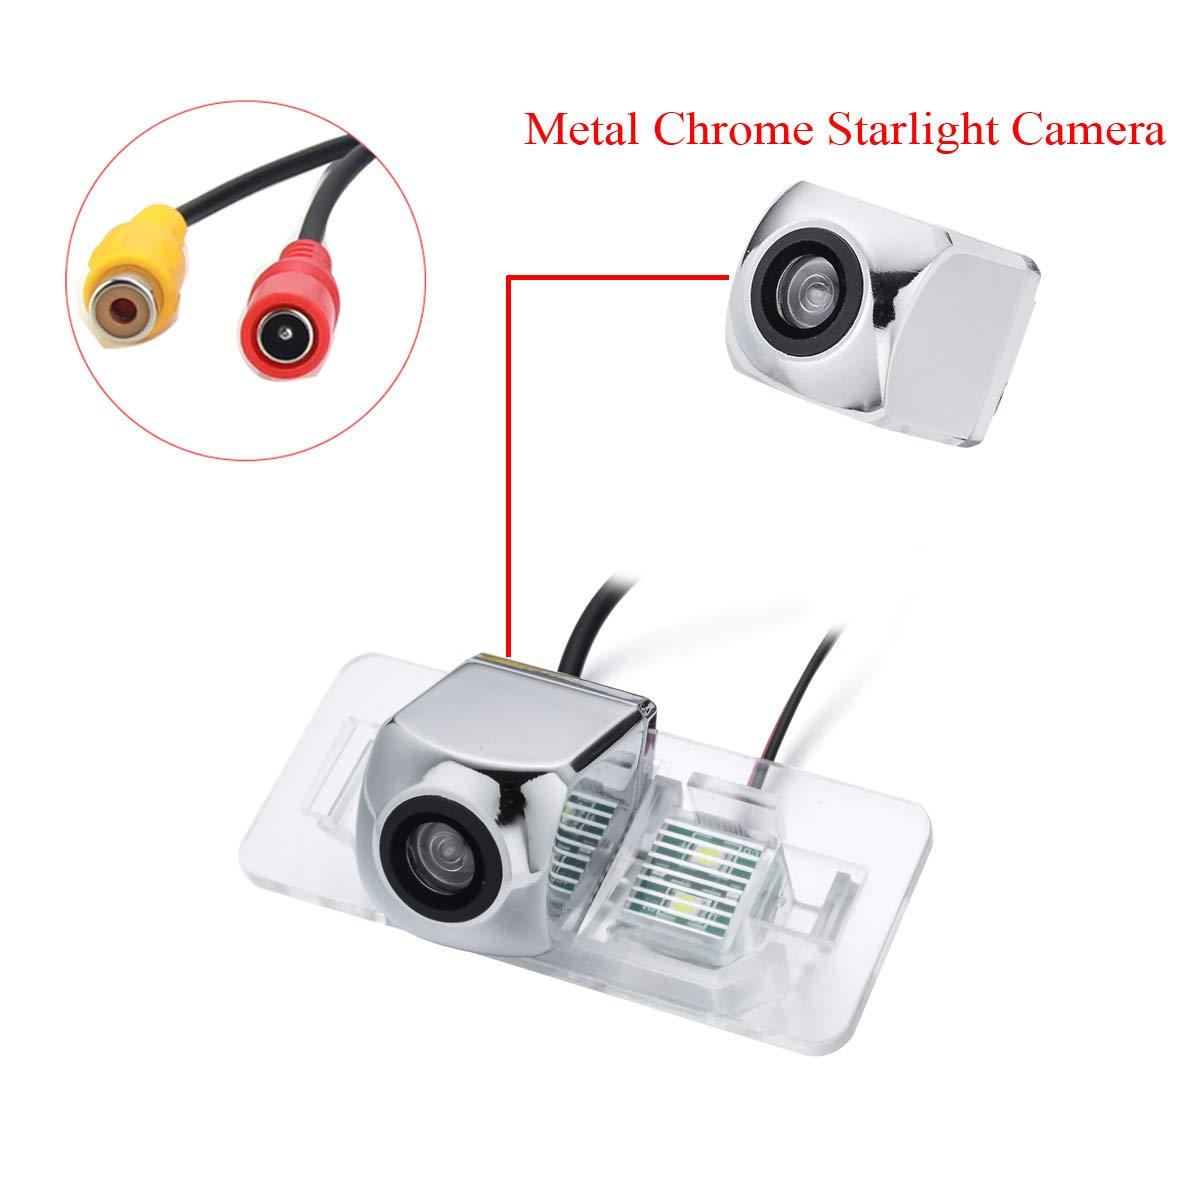 aSATAH Chrome Starlight Car Rear View Camera for BMW 3 E46 E90 E91 E92 5 E39 E60 E61 X5 E53 E70 /& Vehicle Camera Waterproof and Shockproof Reversing Backup Camera Chrome Starlight Camera